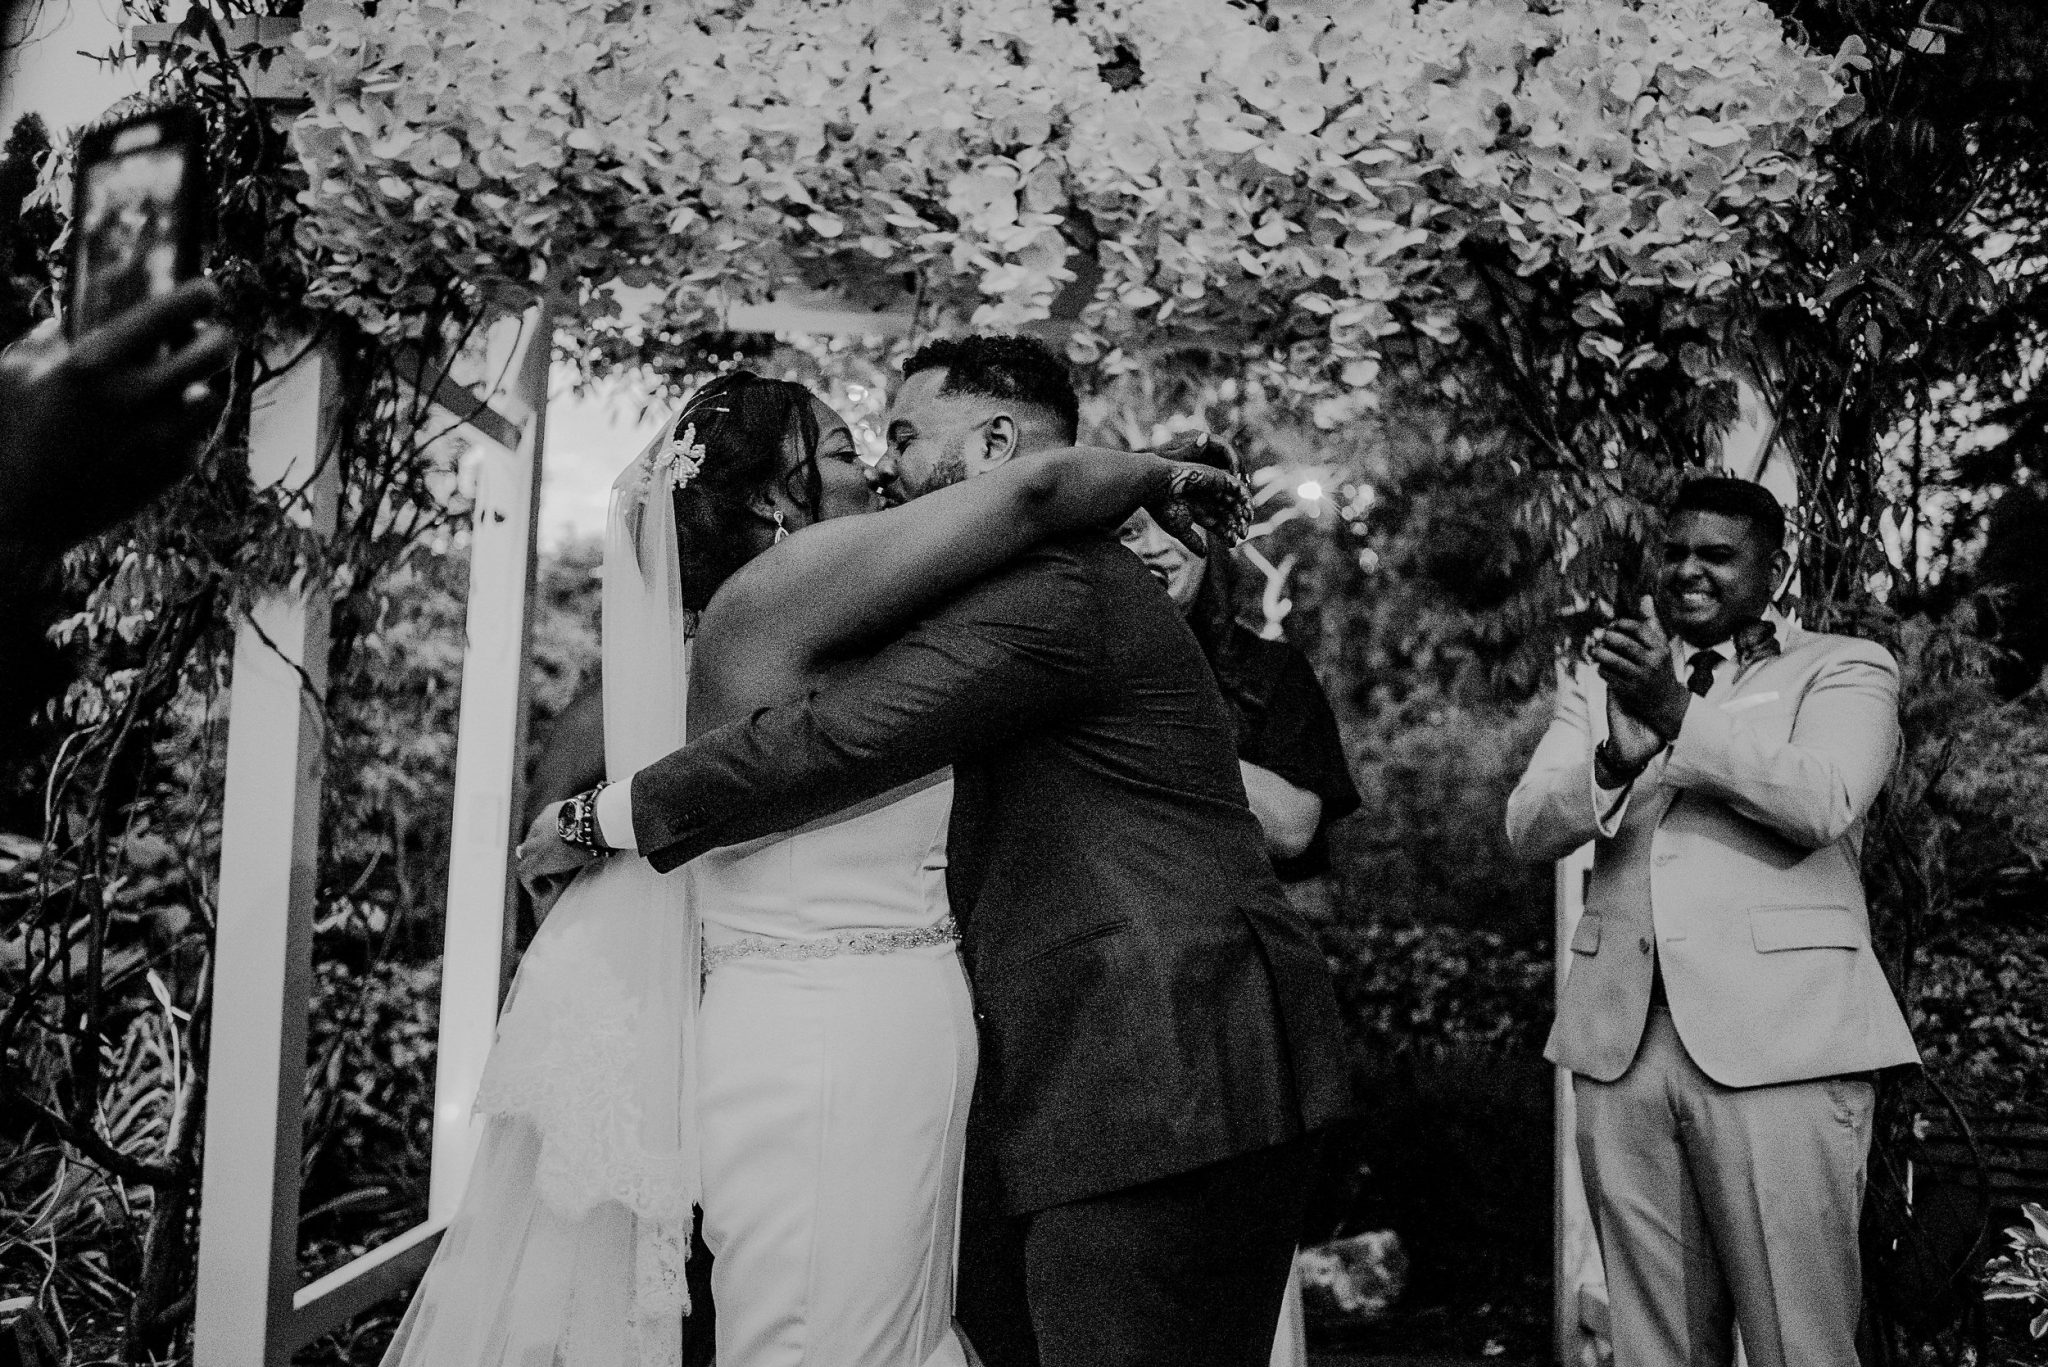 candid photo of outdoor wedding ceremony